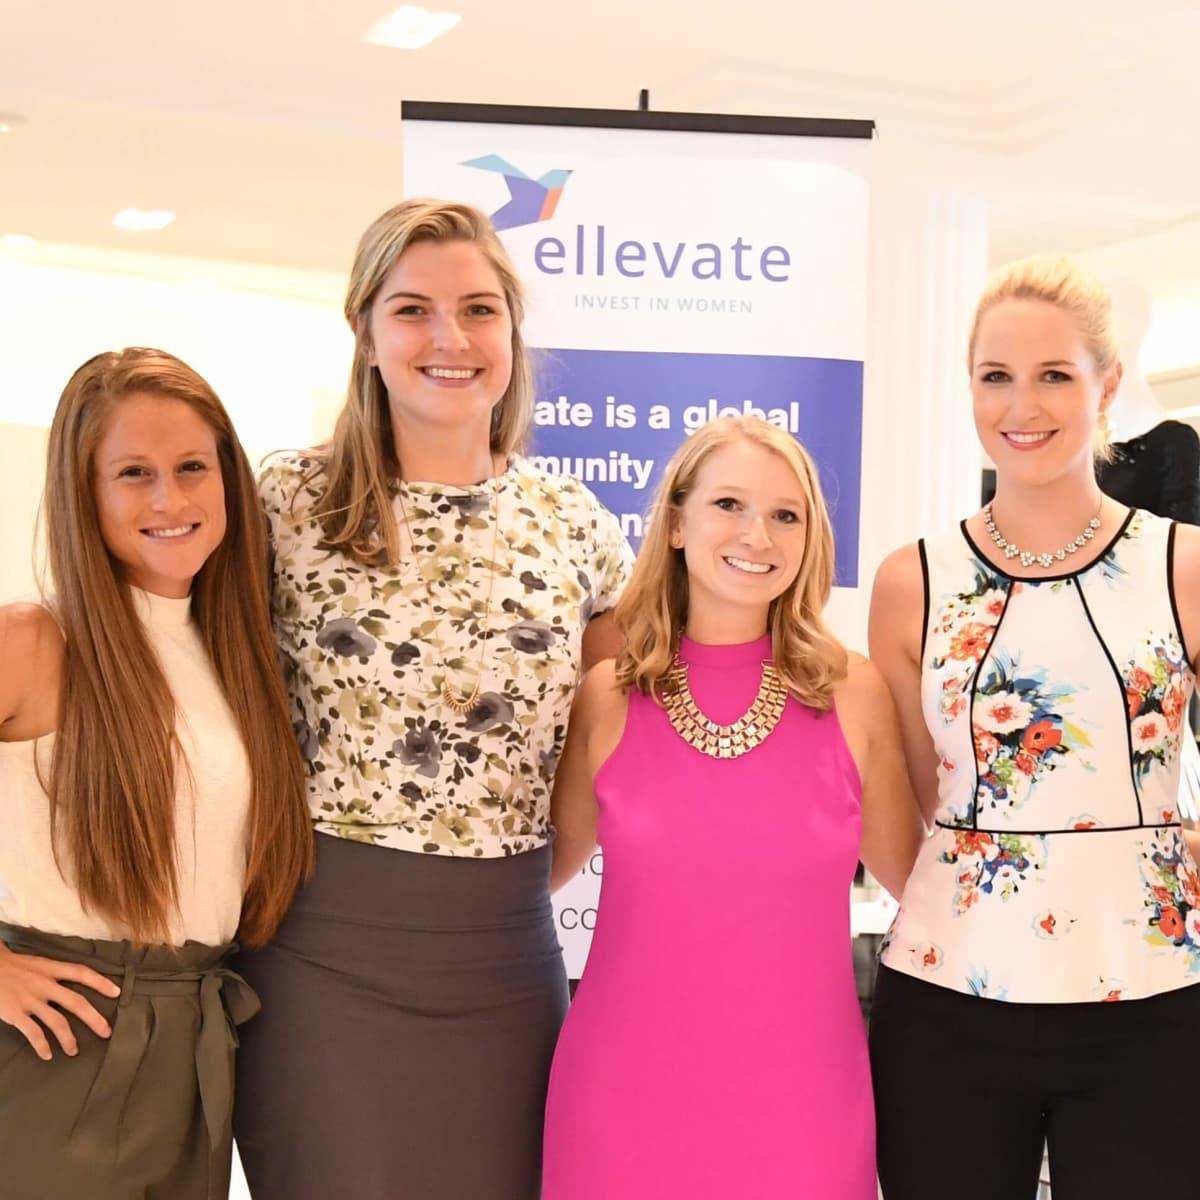 Ellevate at Tootsies, 8/16, Kara Hoffman, Liz Hartwig, Amanda Cotler, Shannon LeMaster